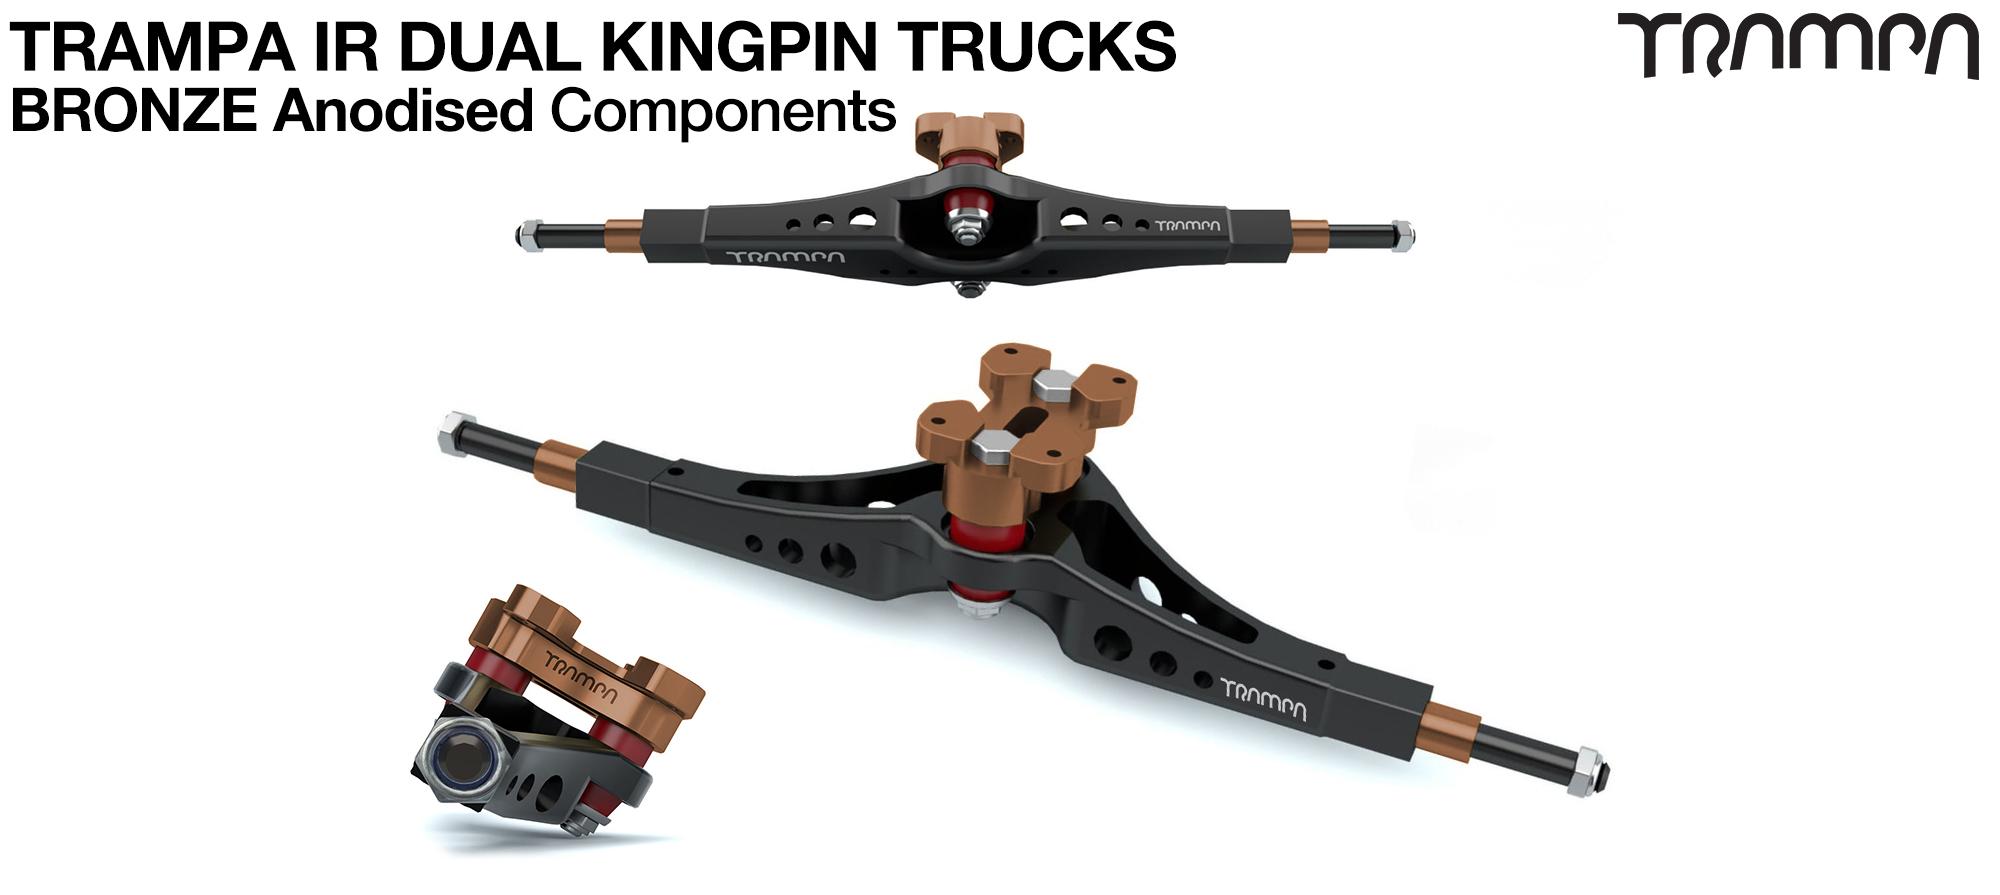 TRAMPA IR Double Kingpinned Skate Style Trucks fit every 19.1mm Motor Mount TRAMPA offers - BRONZE